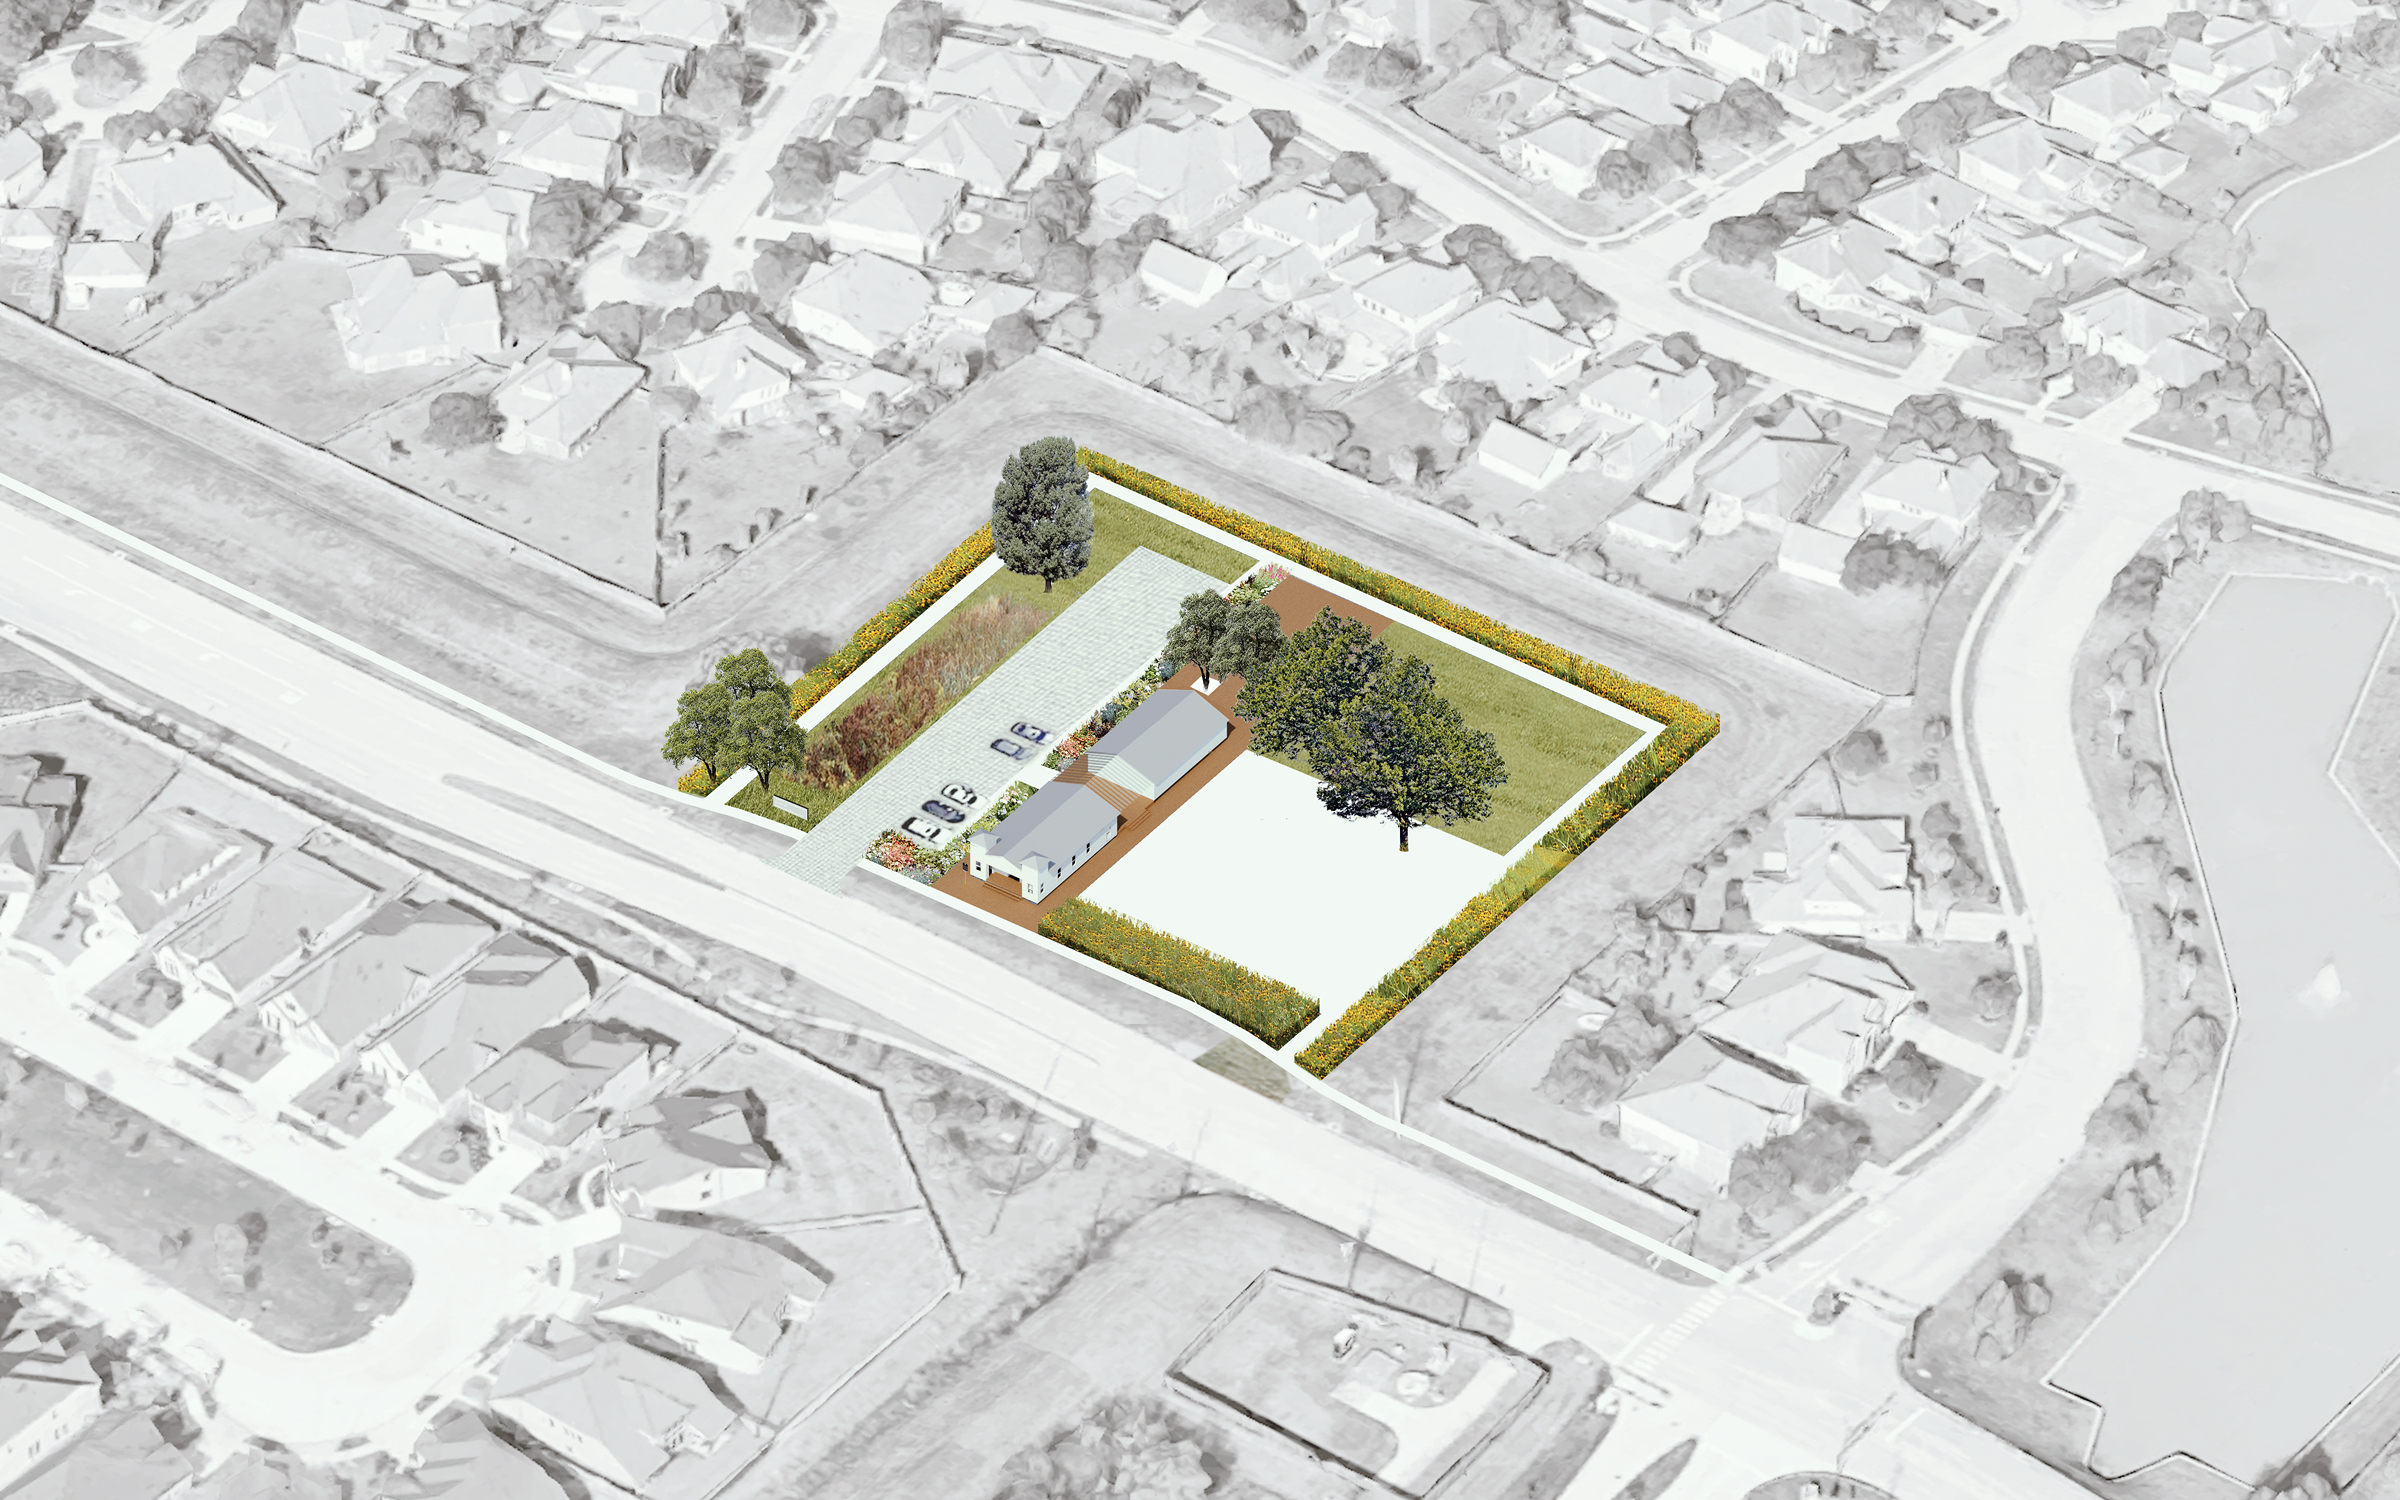 Cadaster | Church Circuit: Architectural and Site Rehabilitation of Saint John Missionary Baptist Church, Houston, USA. By Cadaster